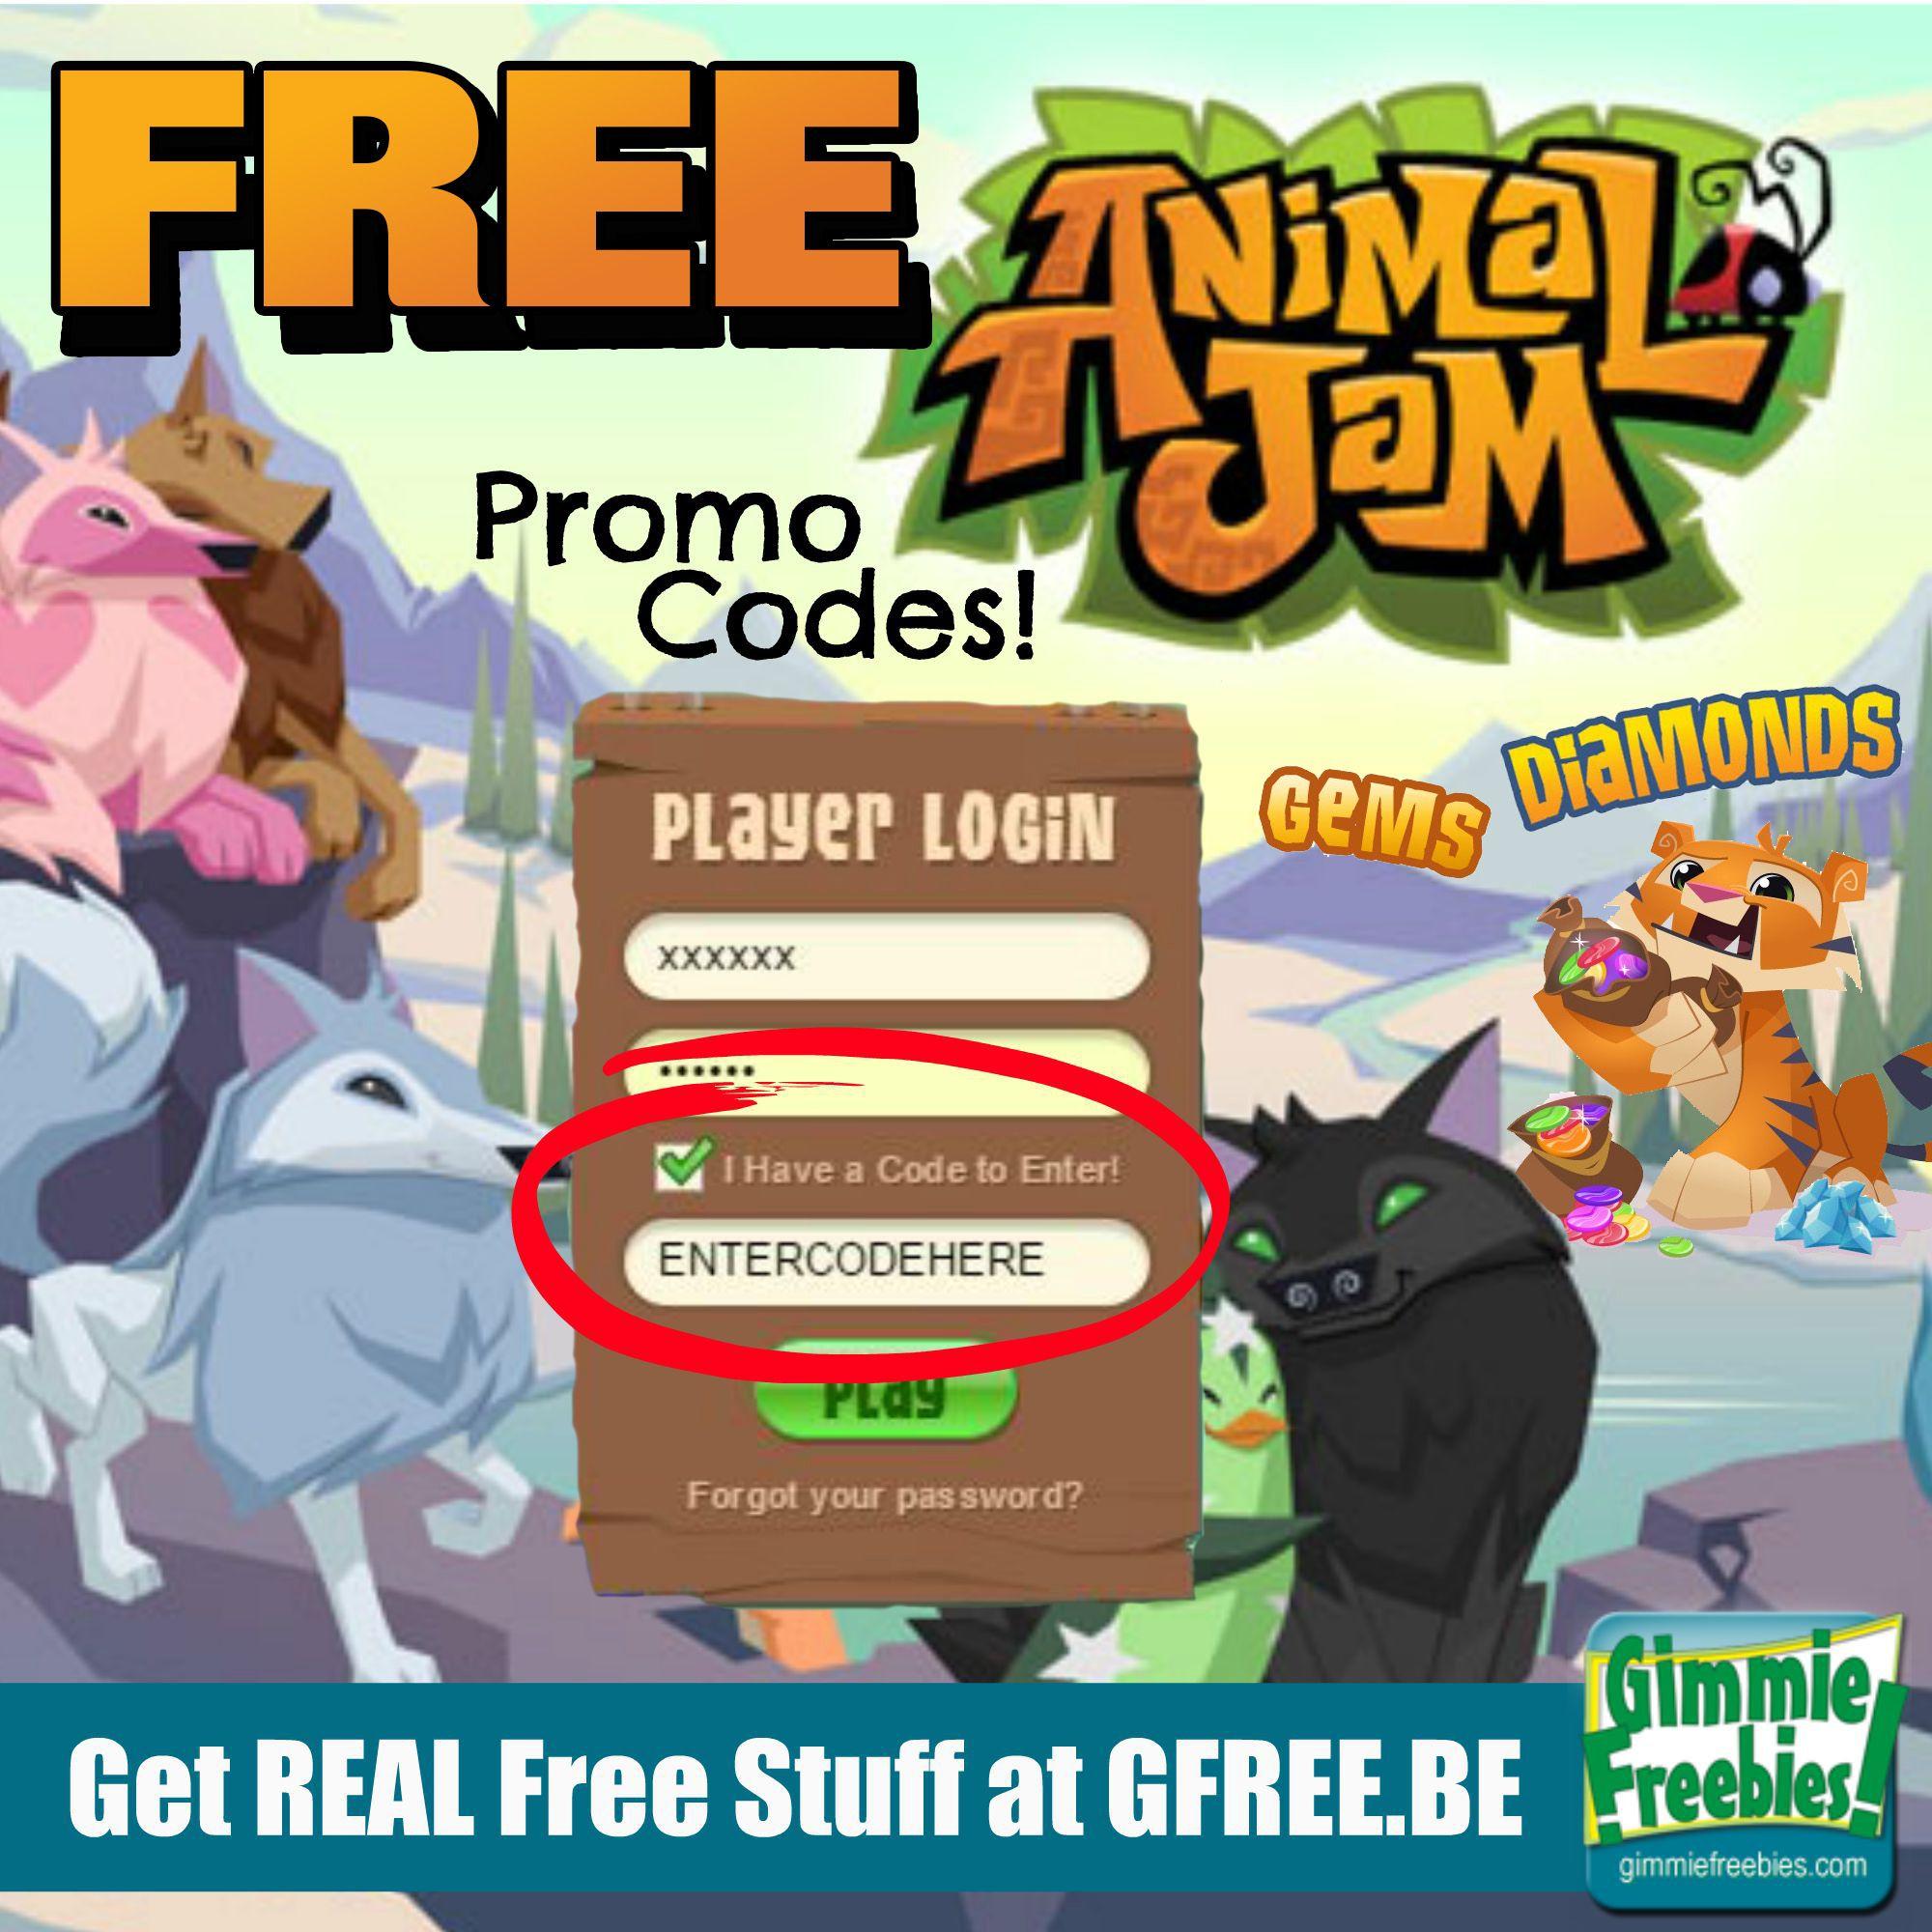 Image of: Gem Animal Jam Promo Codes 2015 Free Diamonds Gems amp Memberships Http Pinterest Animal Jam Promo Codes 2015 Free Stuff Animal Jam Animal Jam